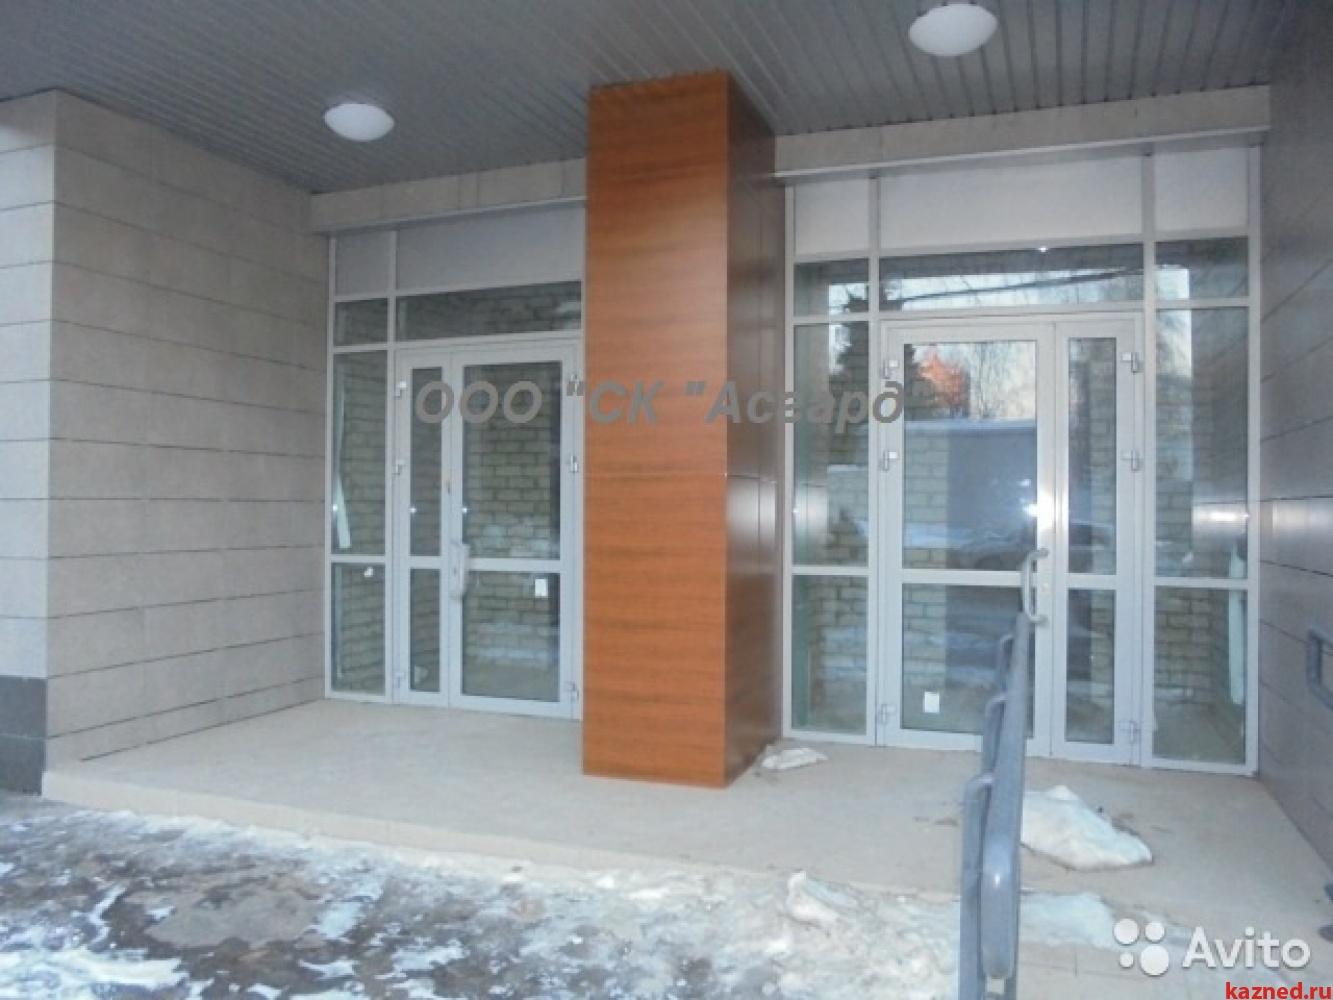 Продажа  офисно-торговые Шуртыгина д.8, 60 м² (миниатюра №2)